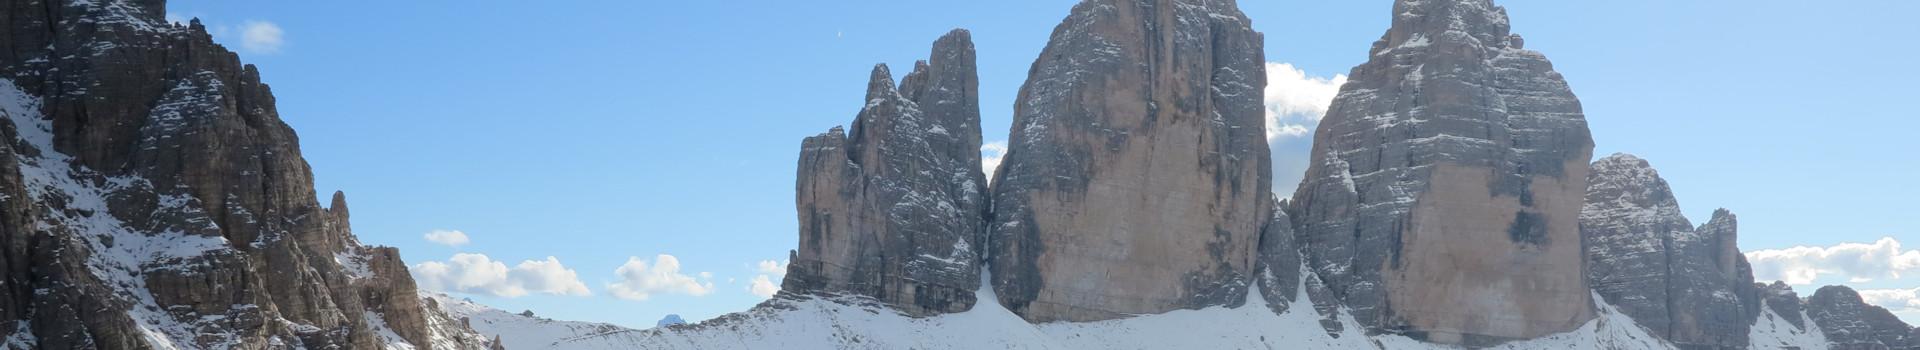 Panoramawege in den Dolomiten